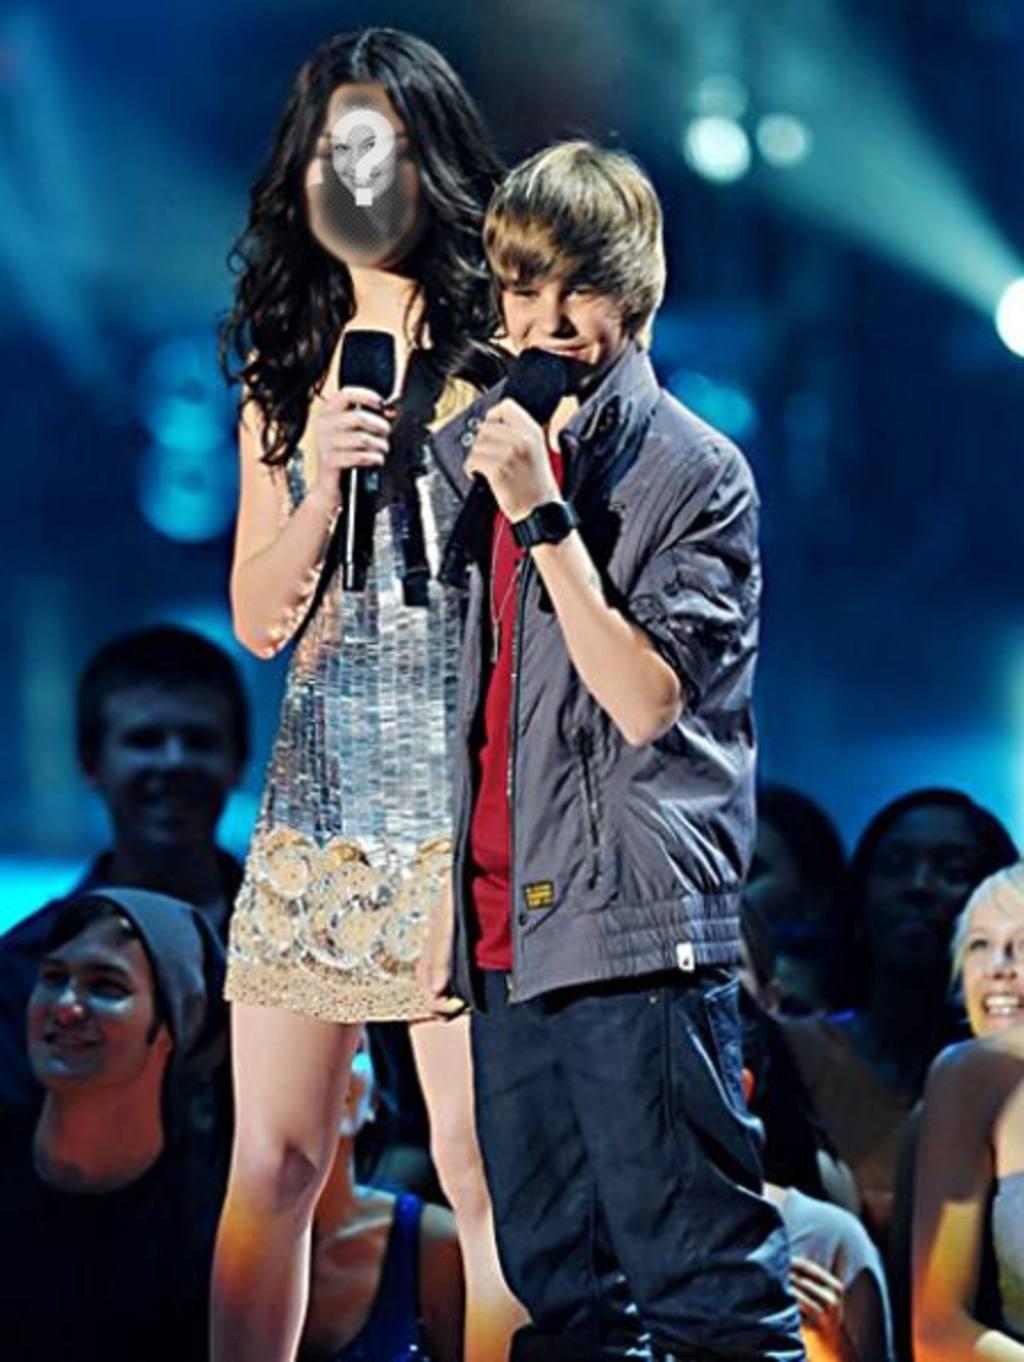 Fotomontaje de Justin Bieber | Hacer Fotomontajes Gratis